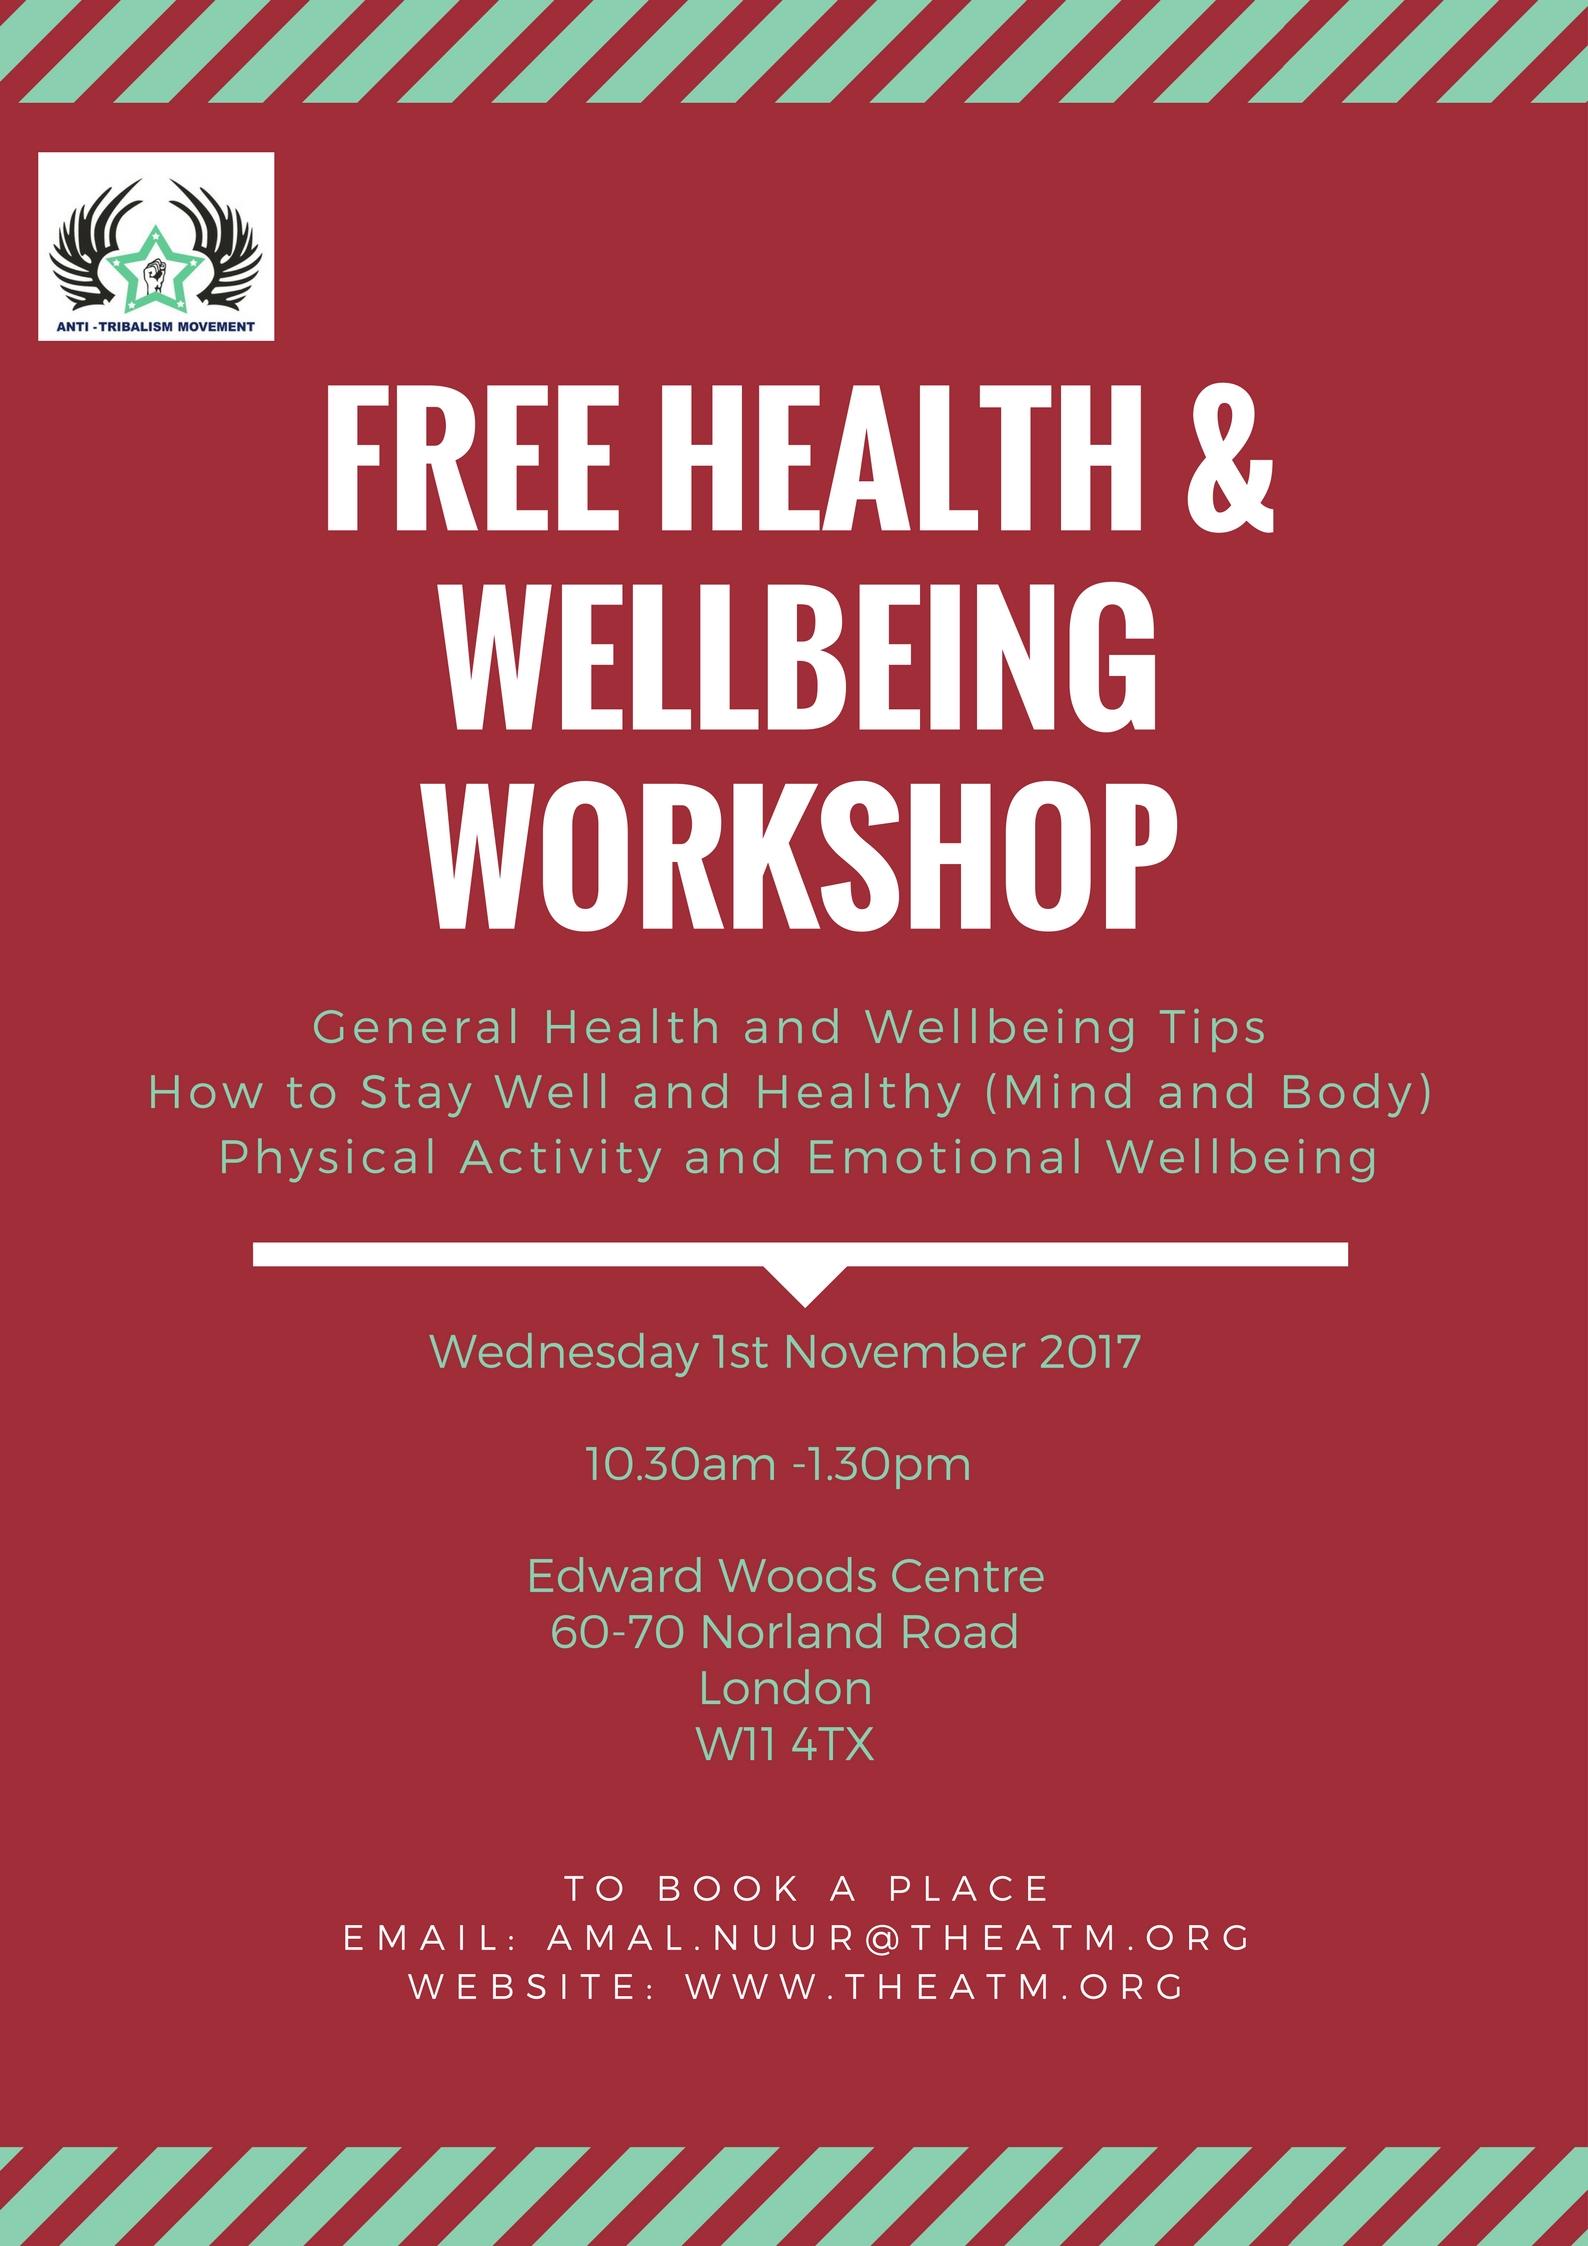 Health & Wellbeing workshop